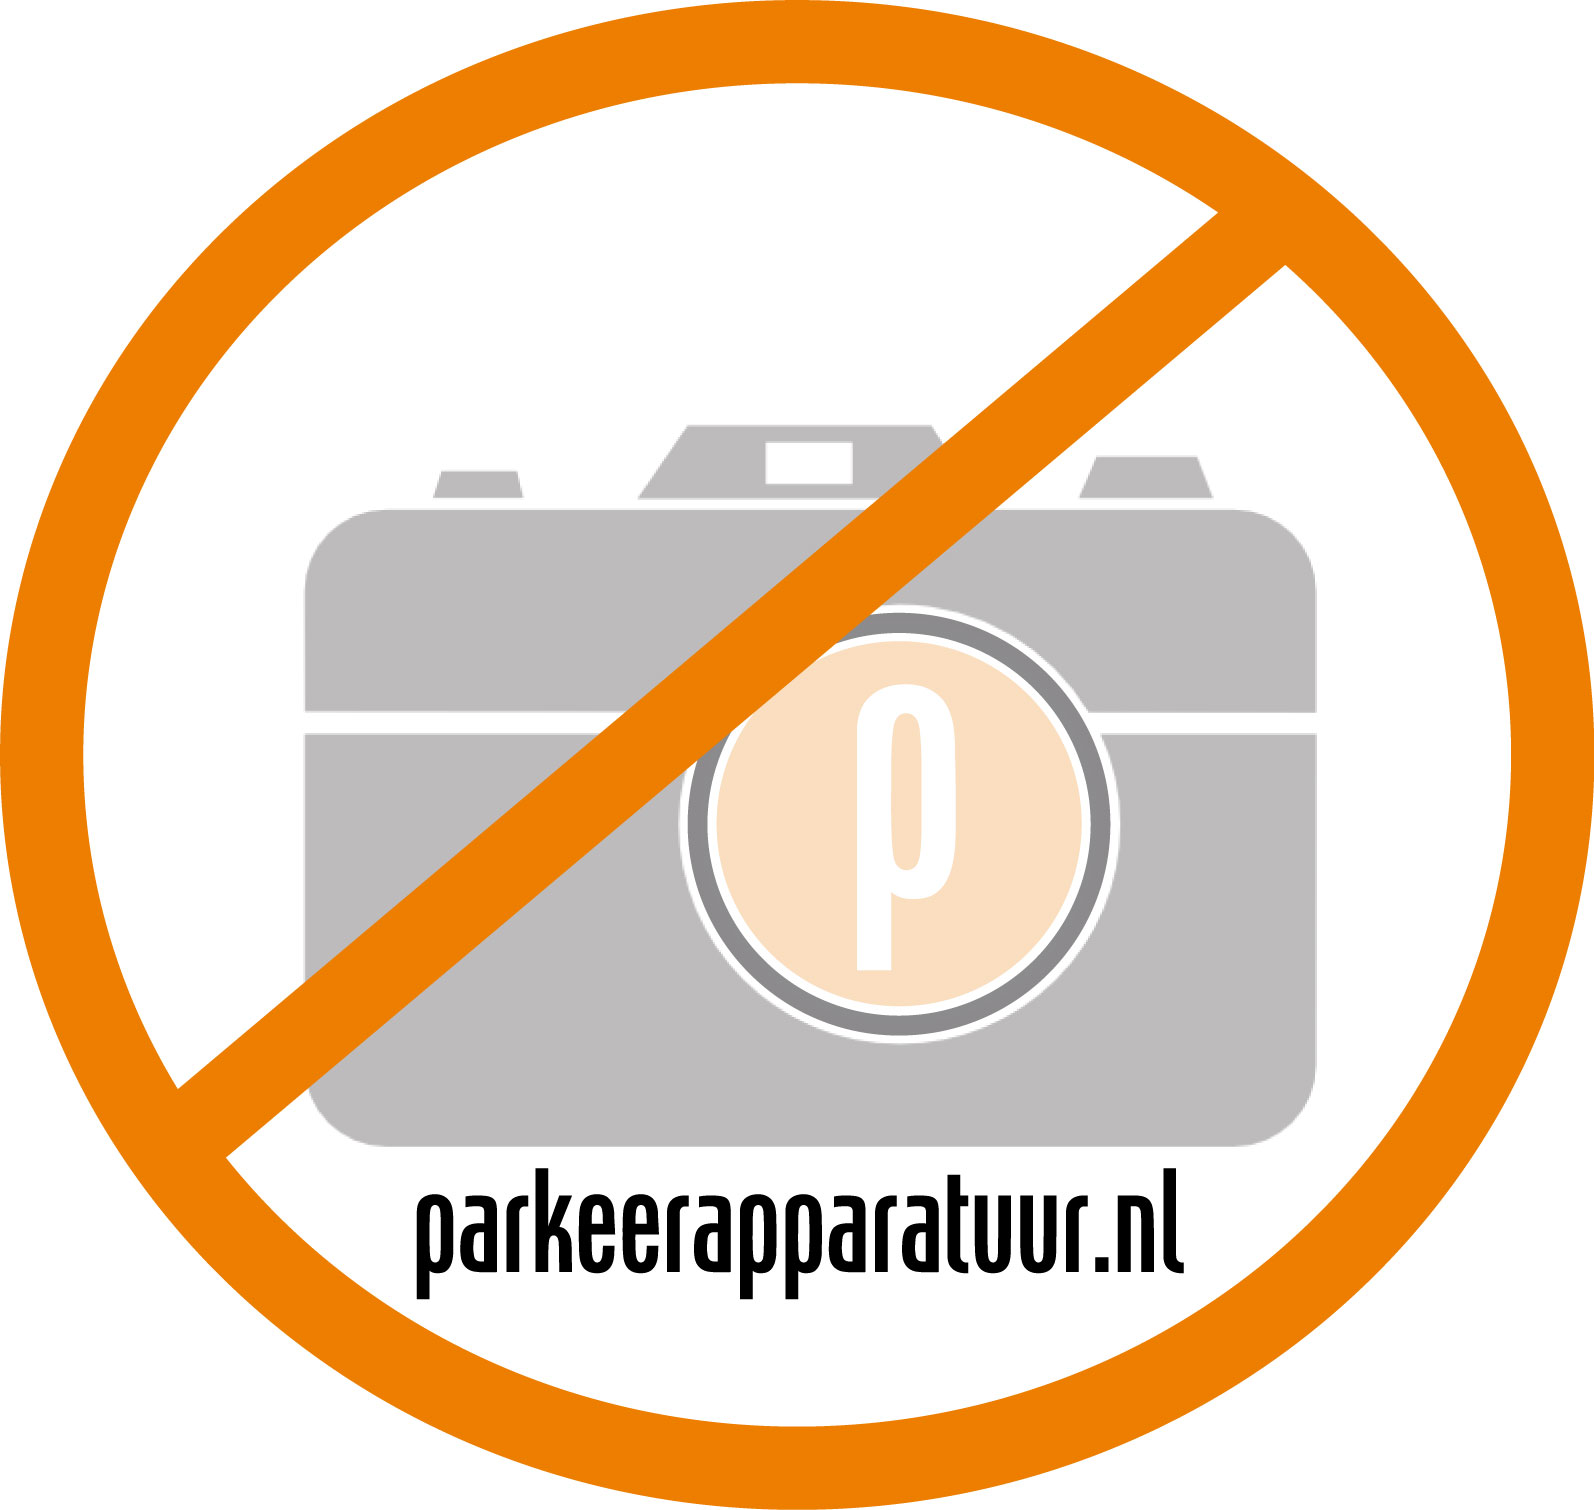 Parkeerverbod-bord Domopark